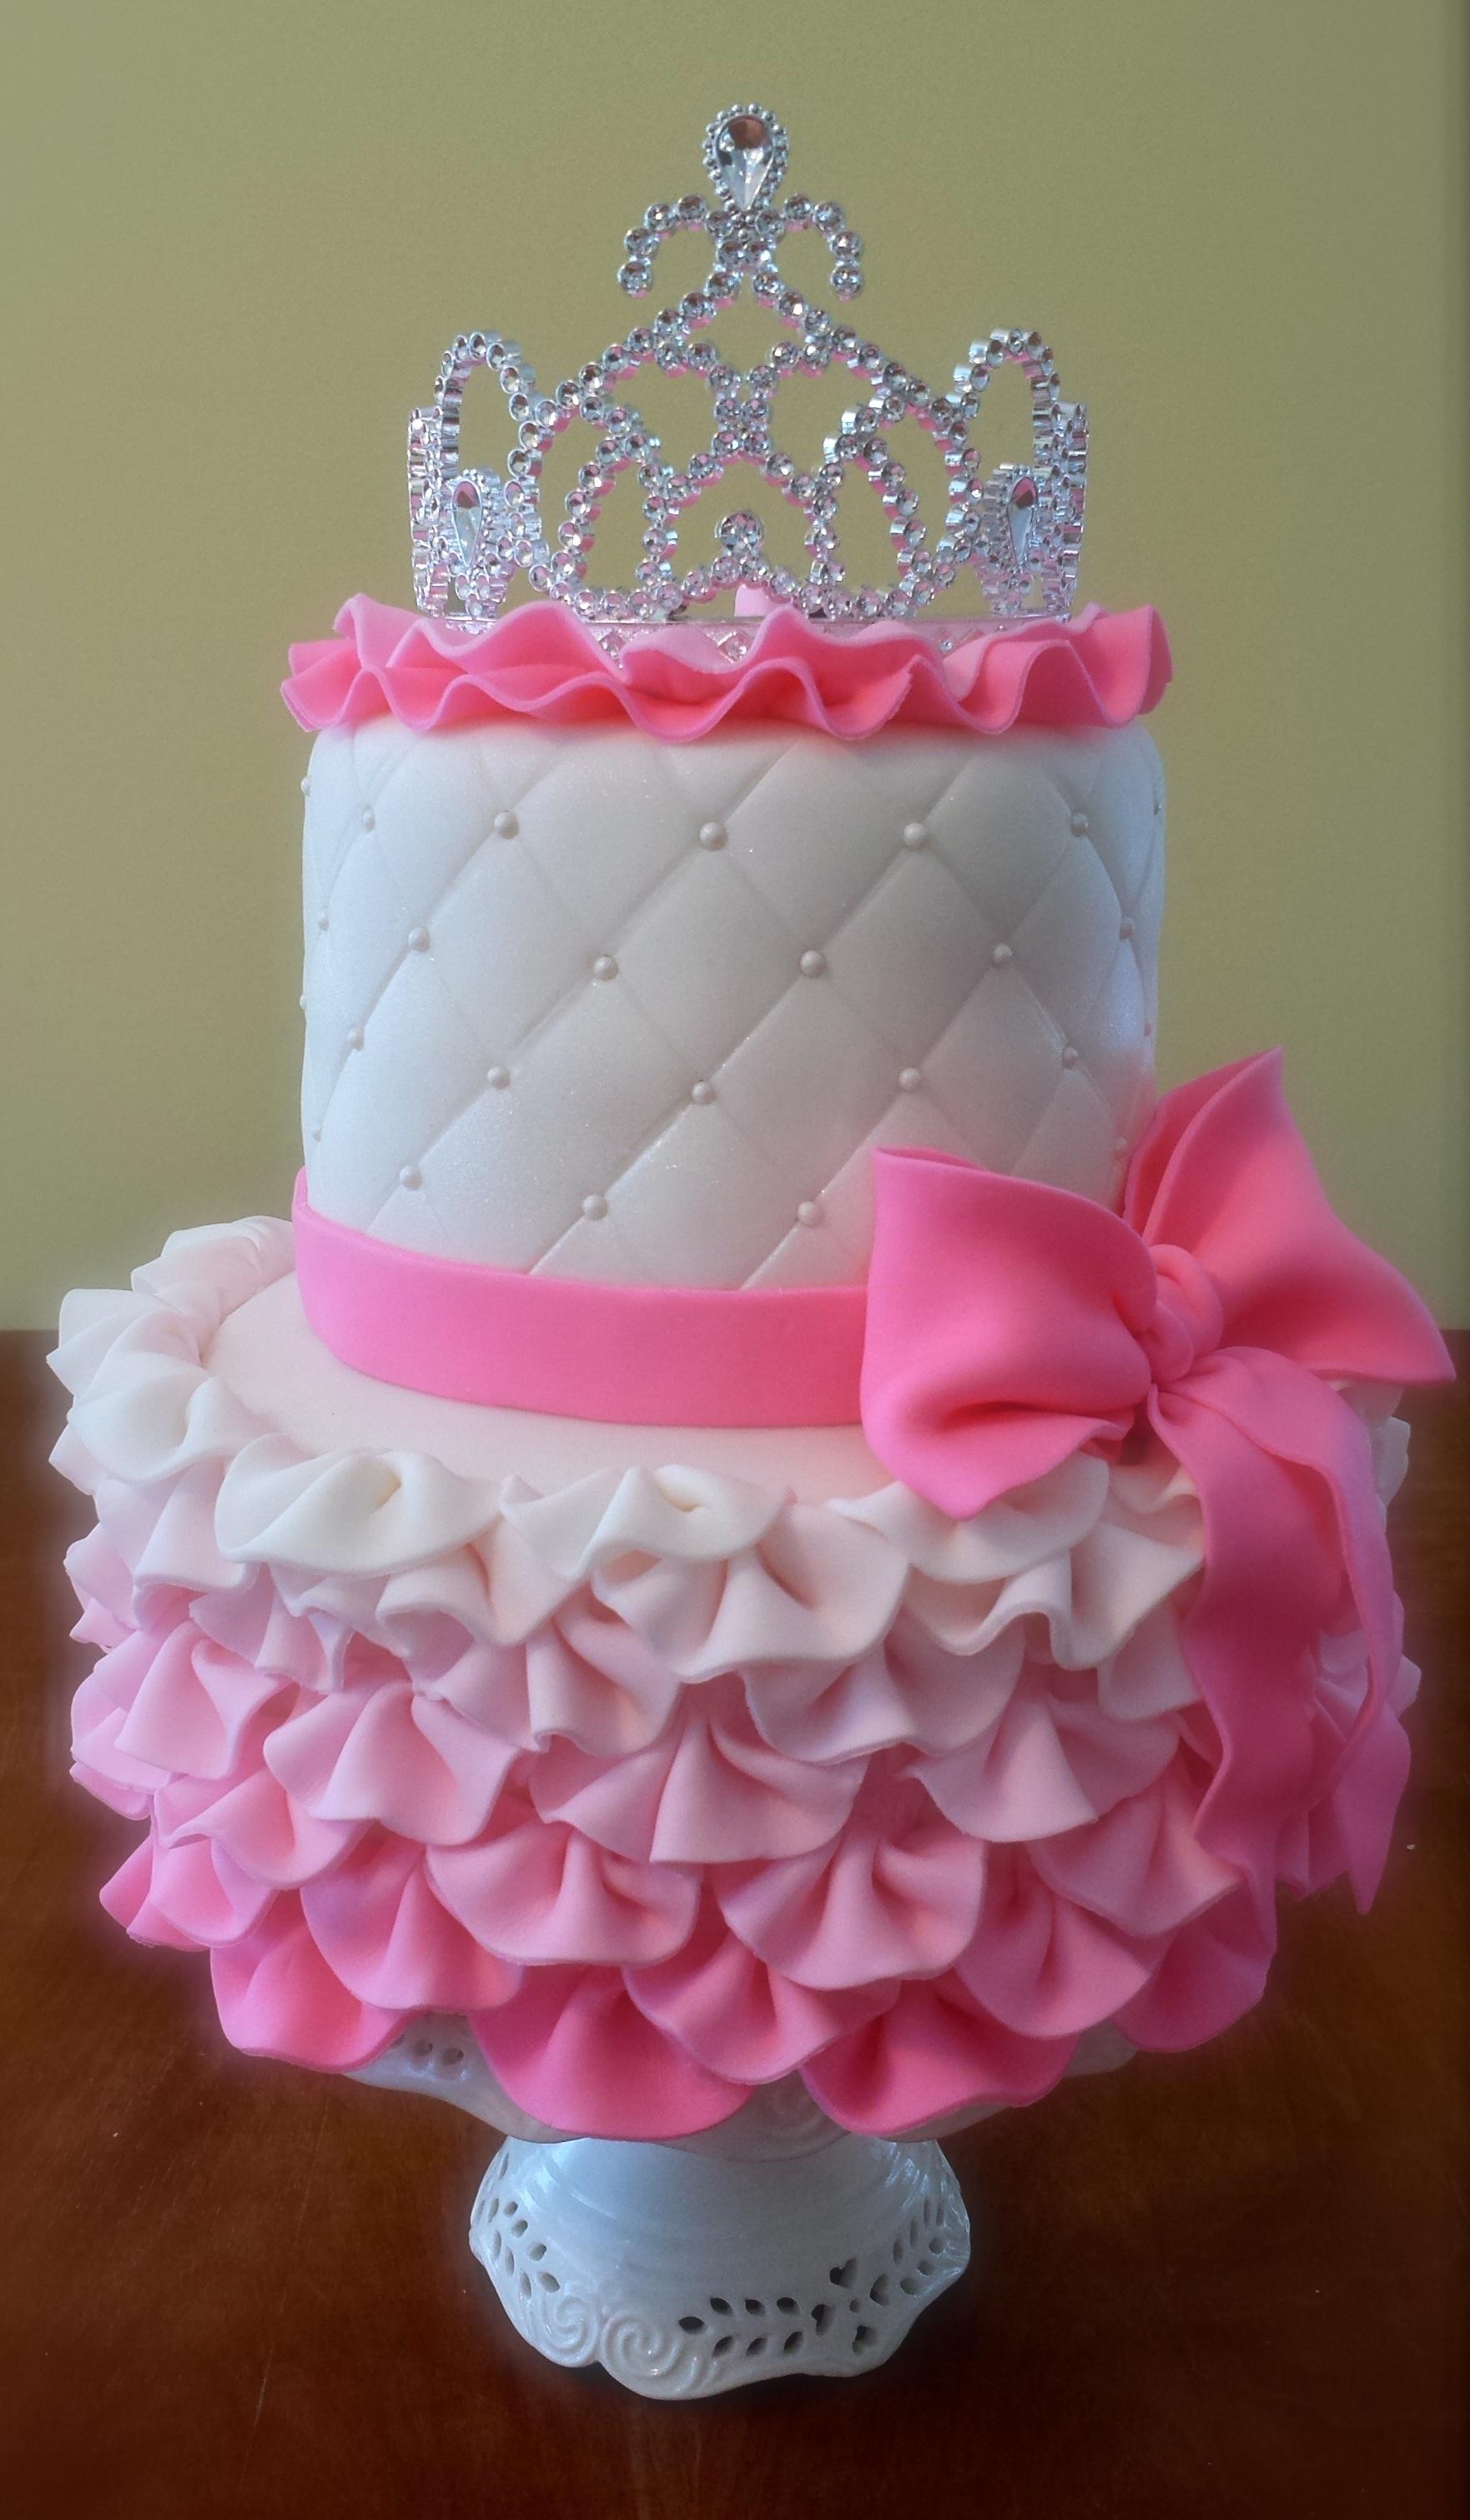 11 Birthday Cakes For Girls Age 2 Photo Cake Ideas